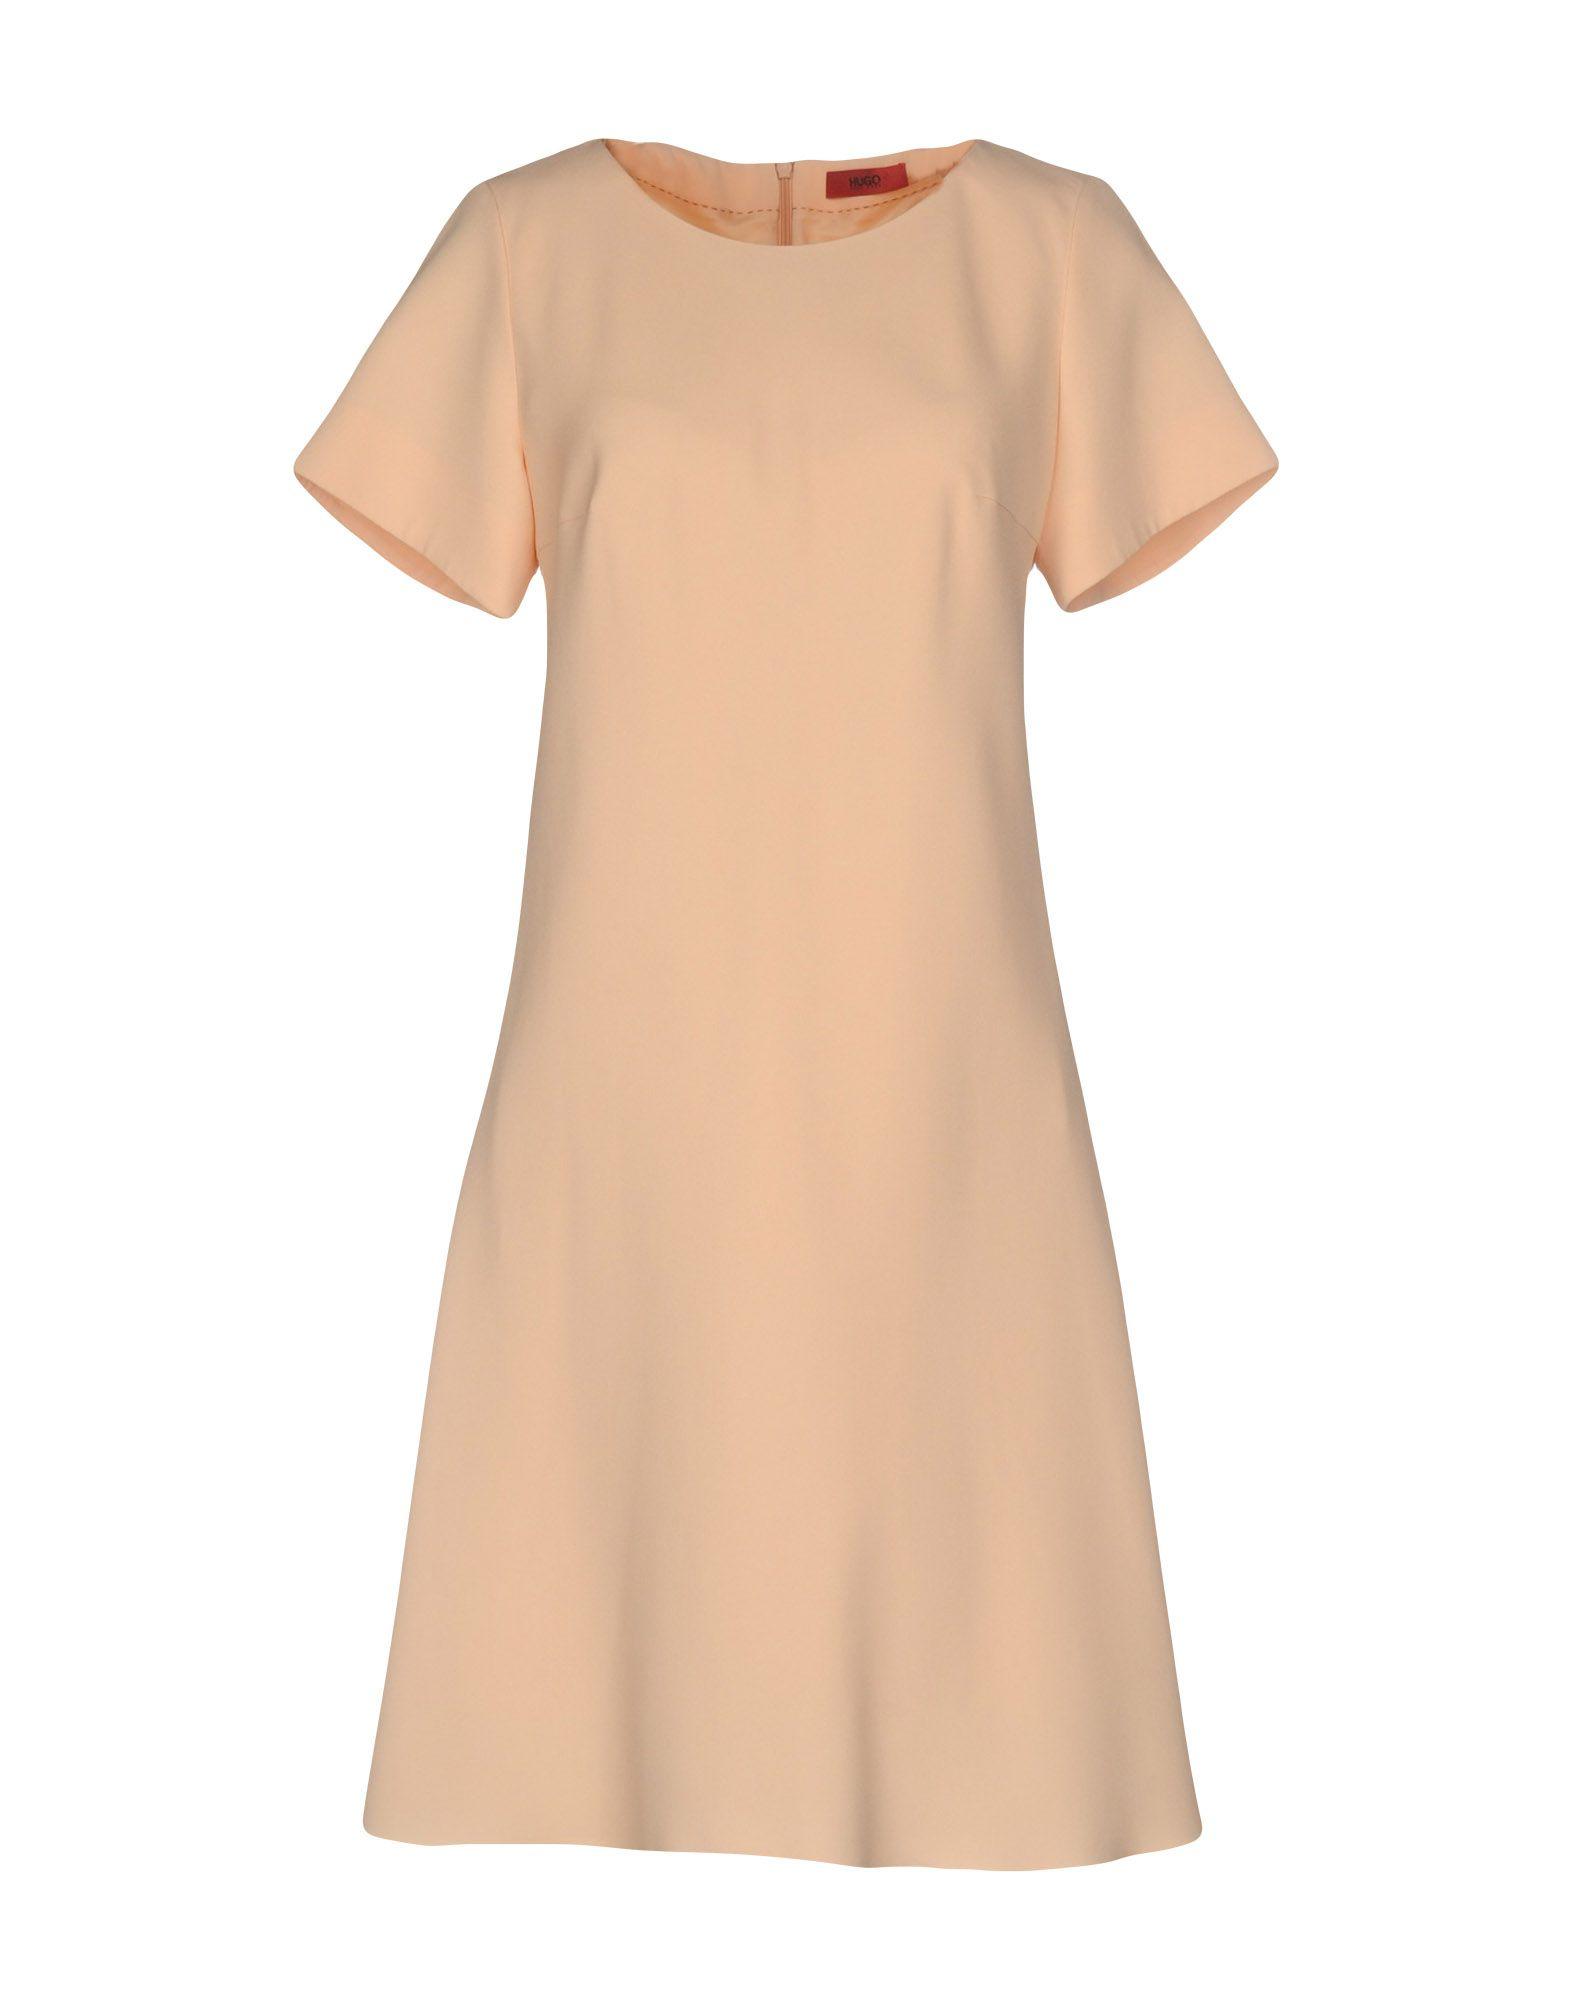 HUGO HUGO BOSS Платье до колена